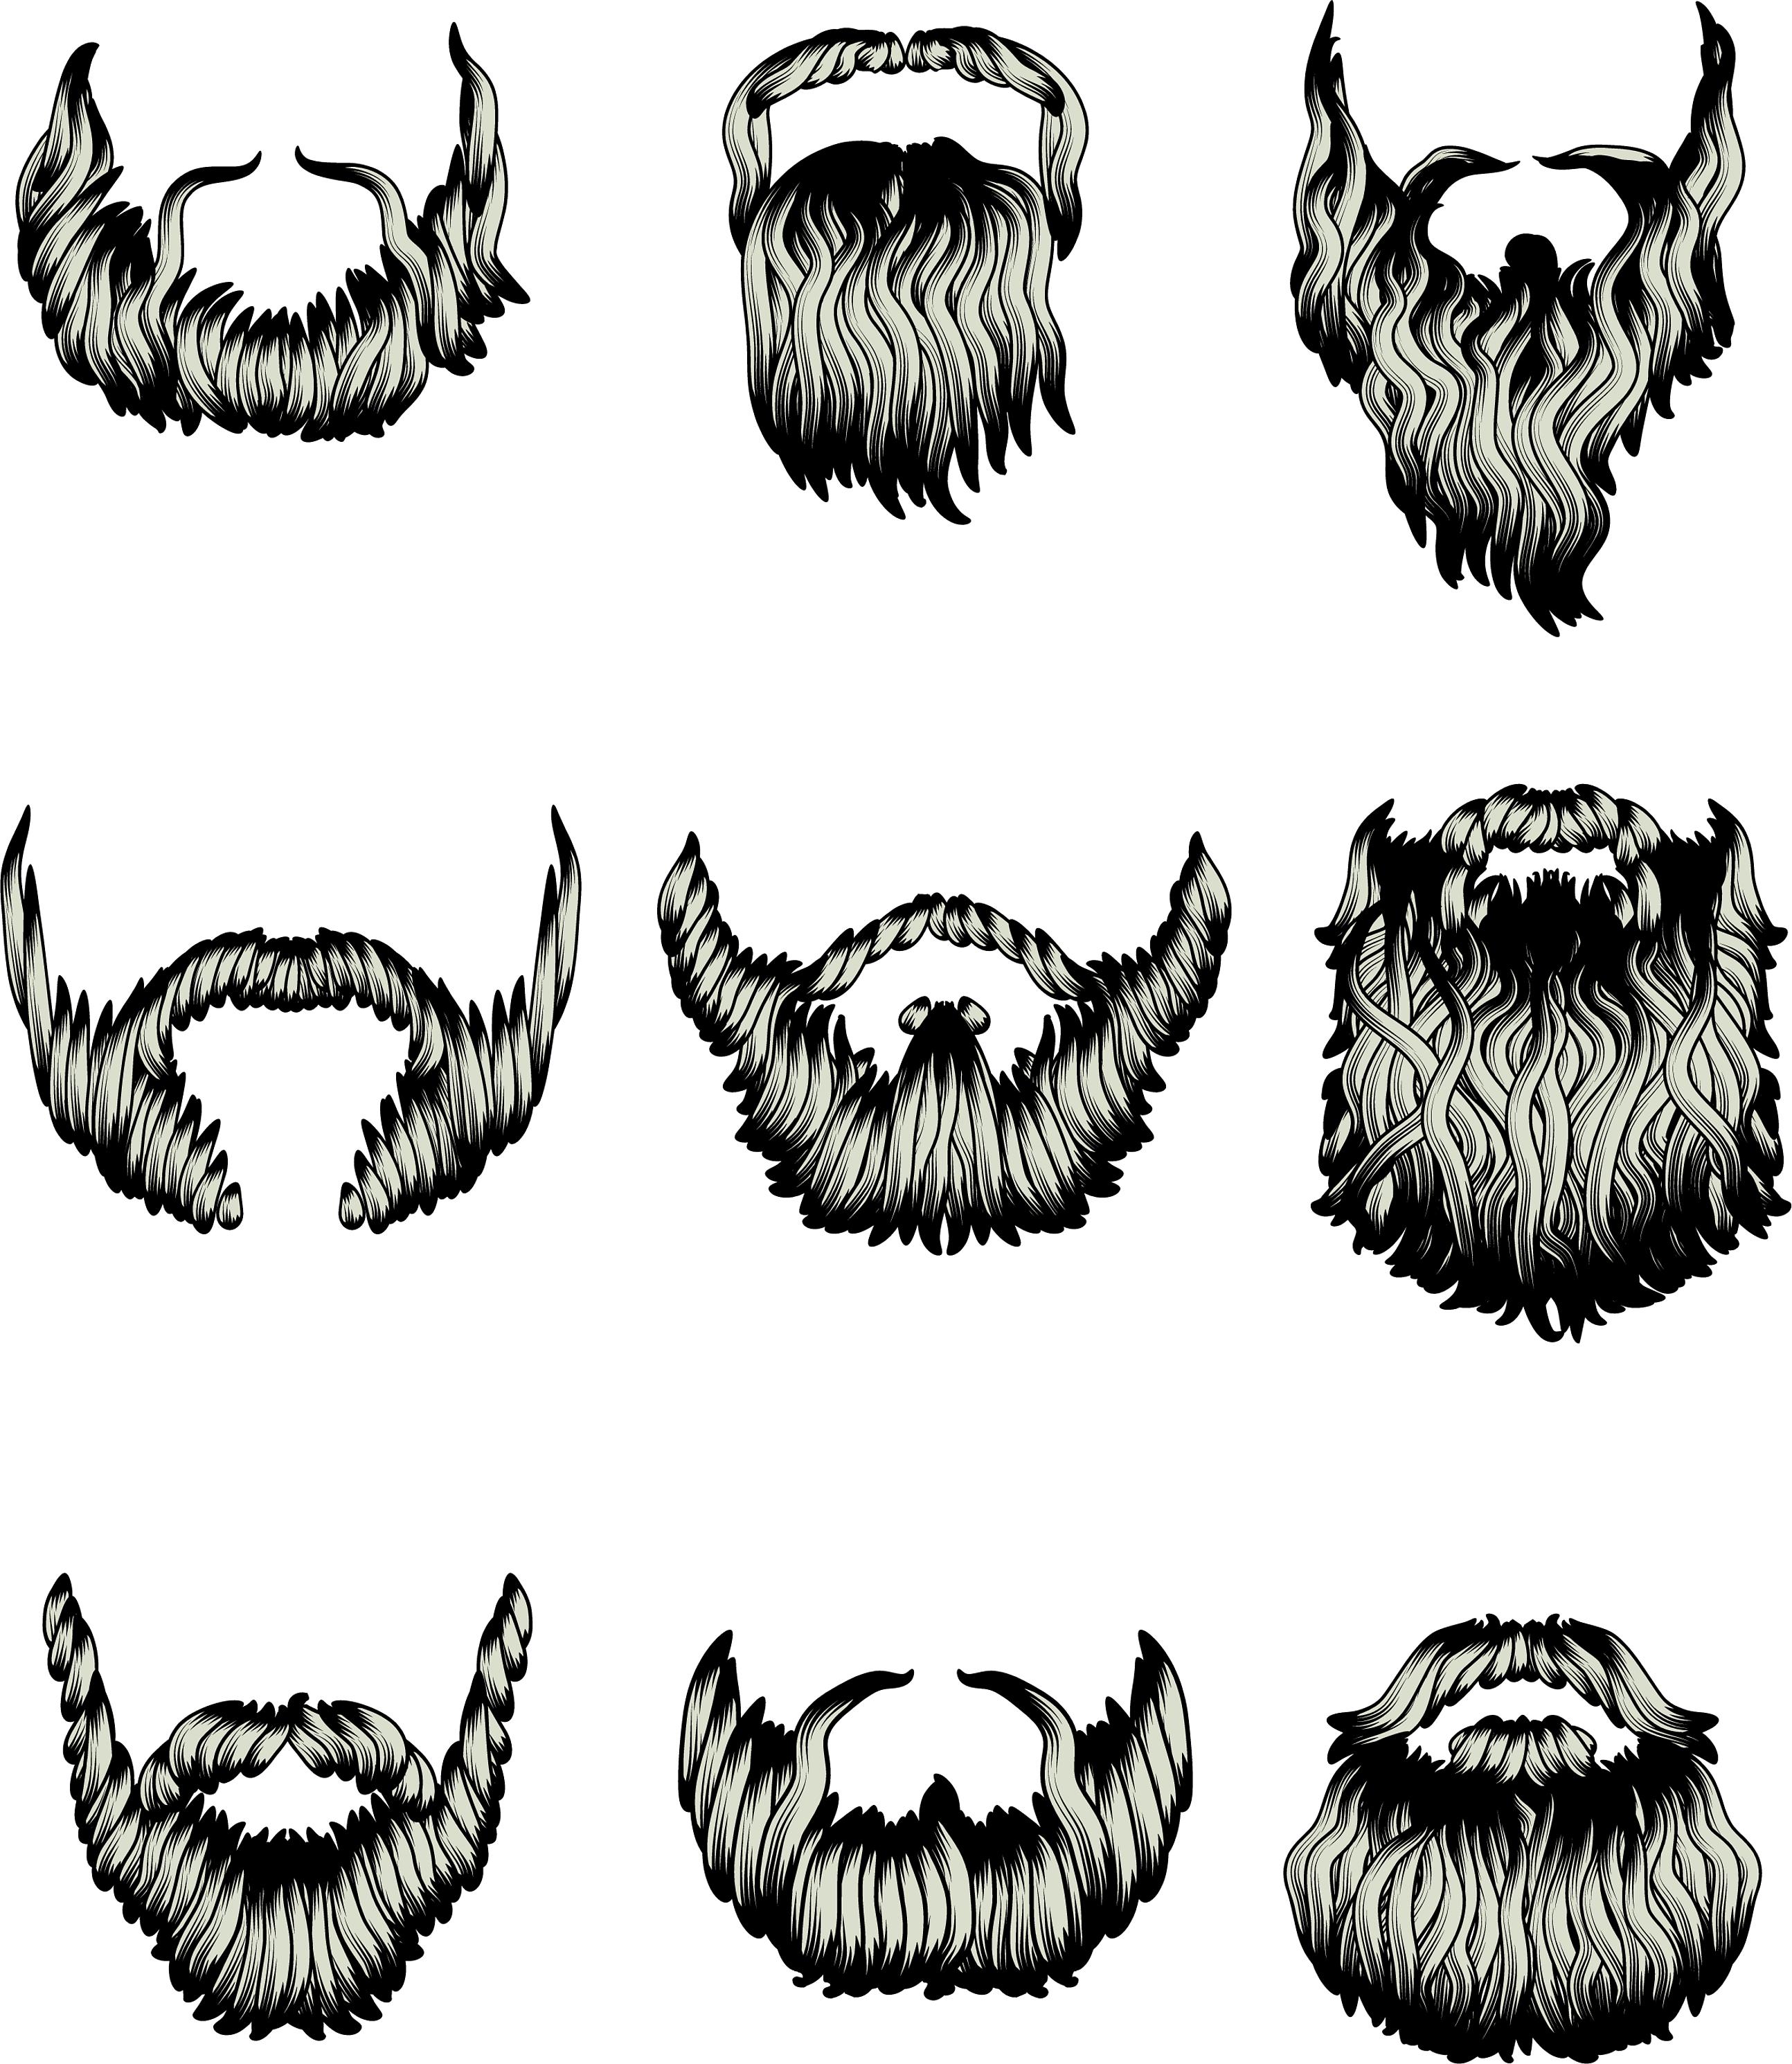 Drawn pirate beard Coke Zero From  Coolternity